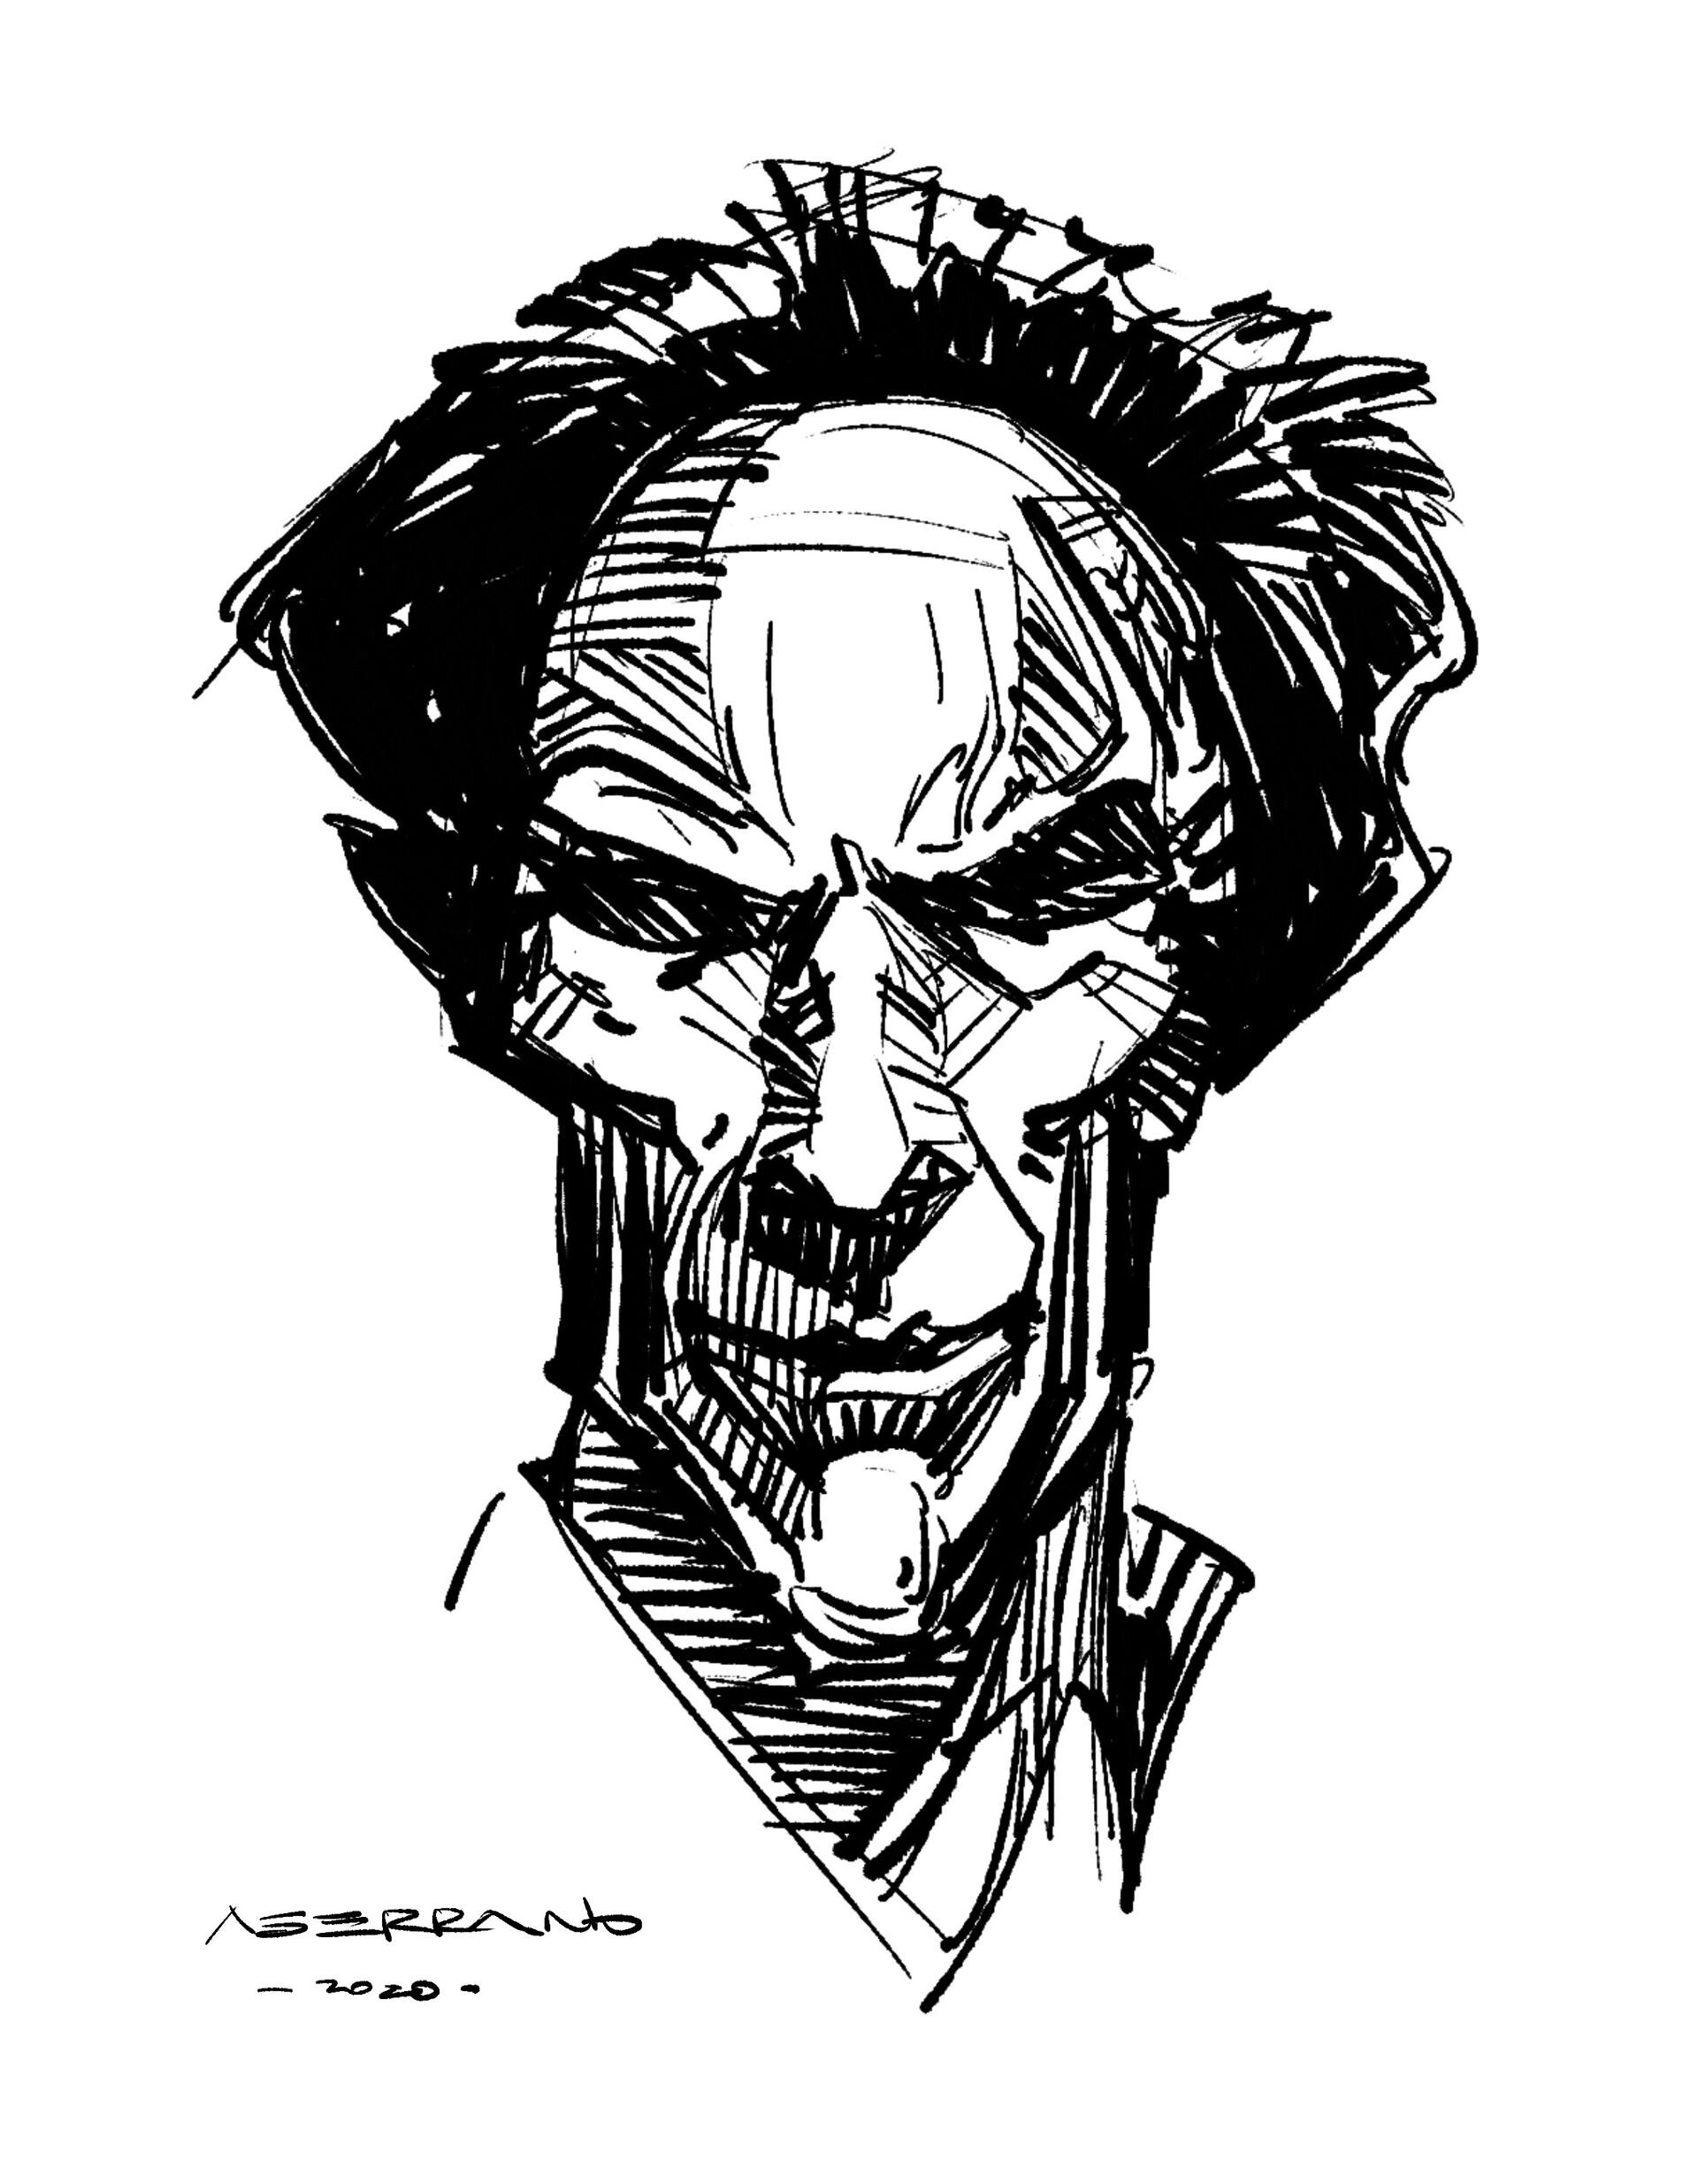 iPad sketch.